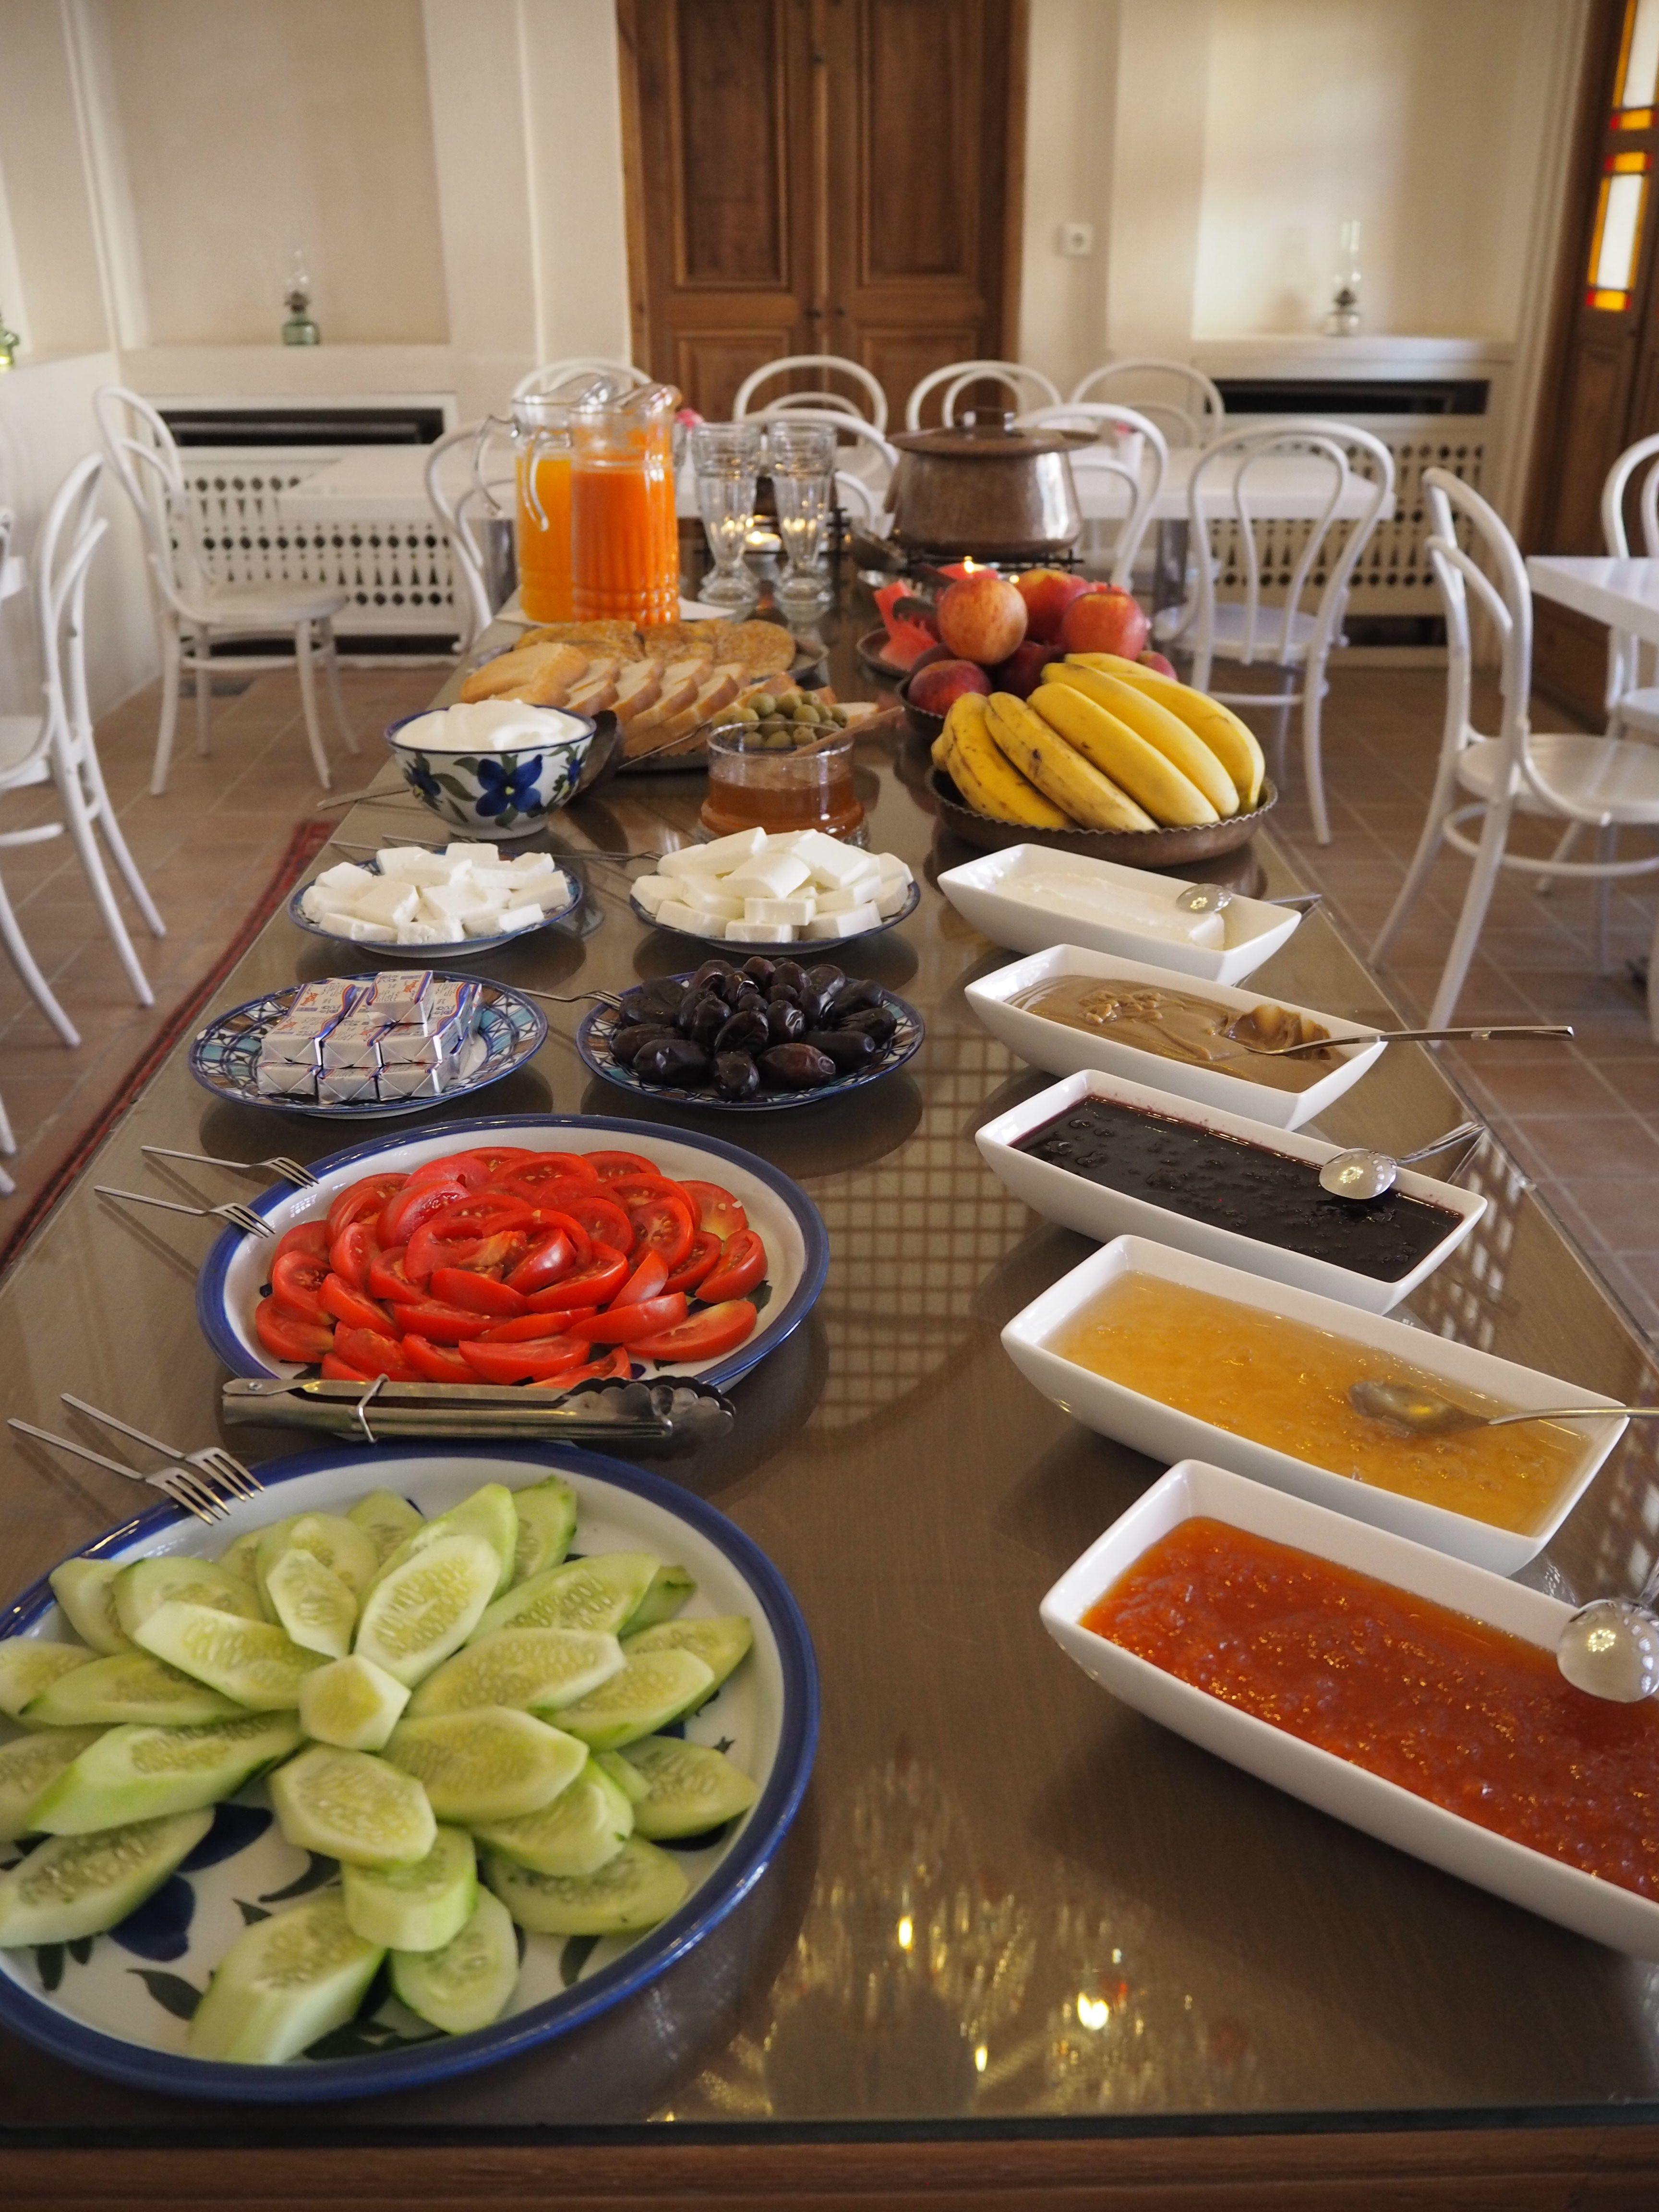 breakfast in Manouchehri House in Kashan